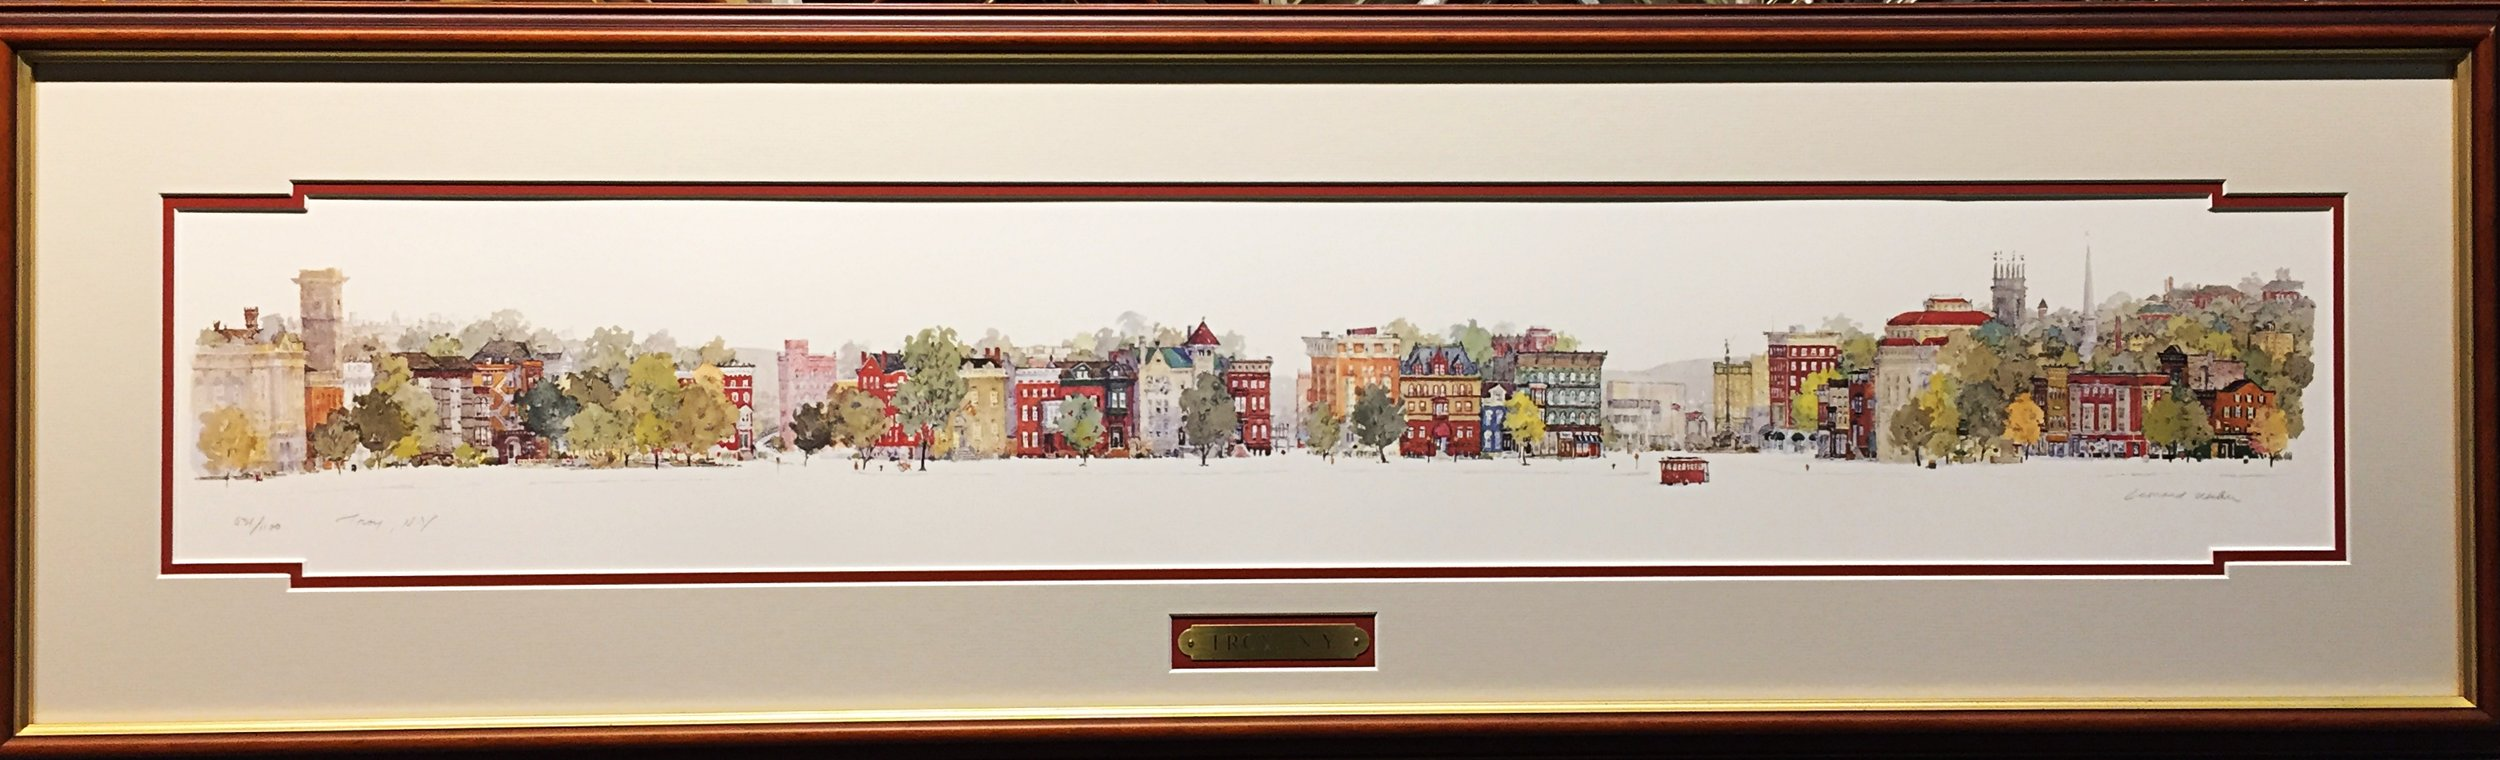 Troy Townscape by Leonard Weber